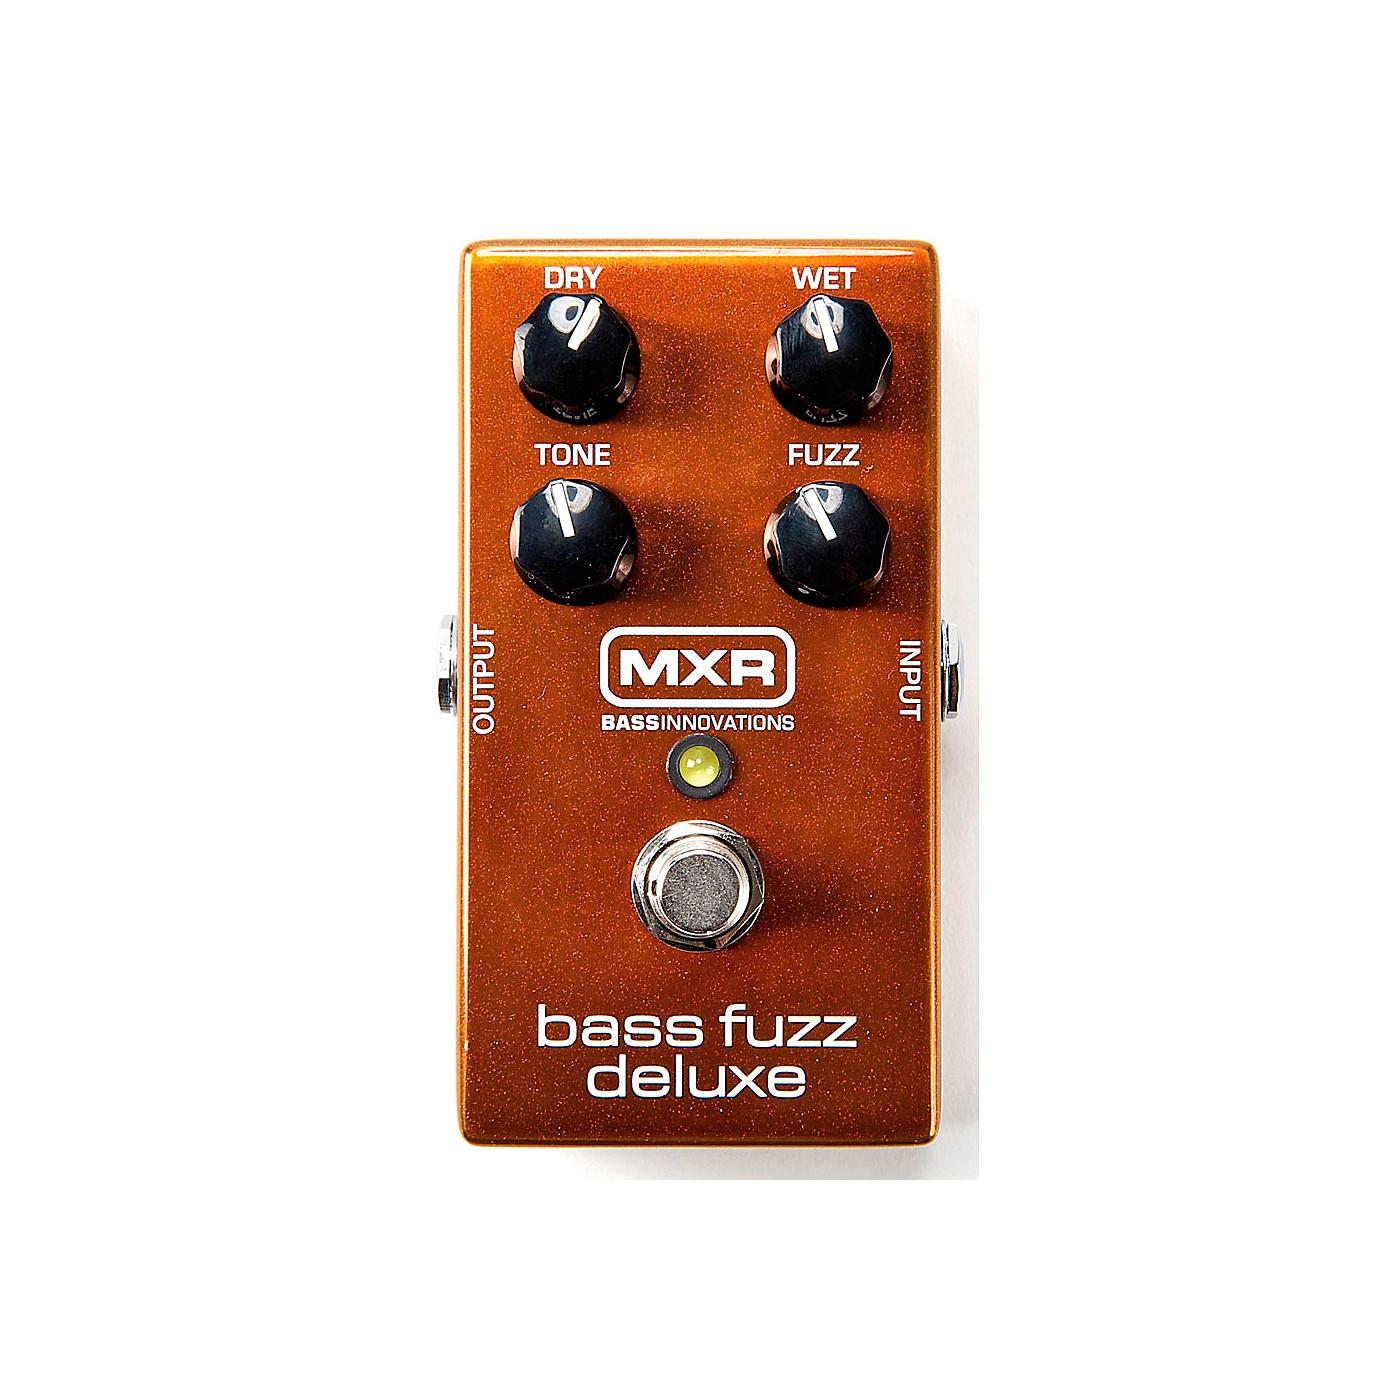 MXR Deluxe Bass Fuzz Effects Pedal thumbnail